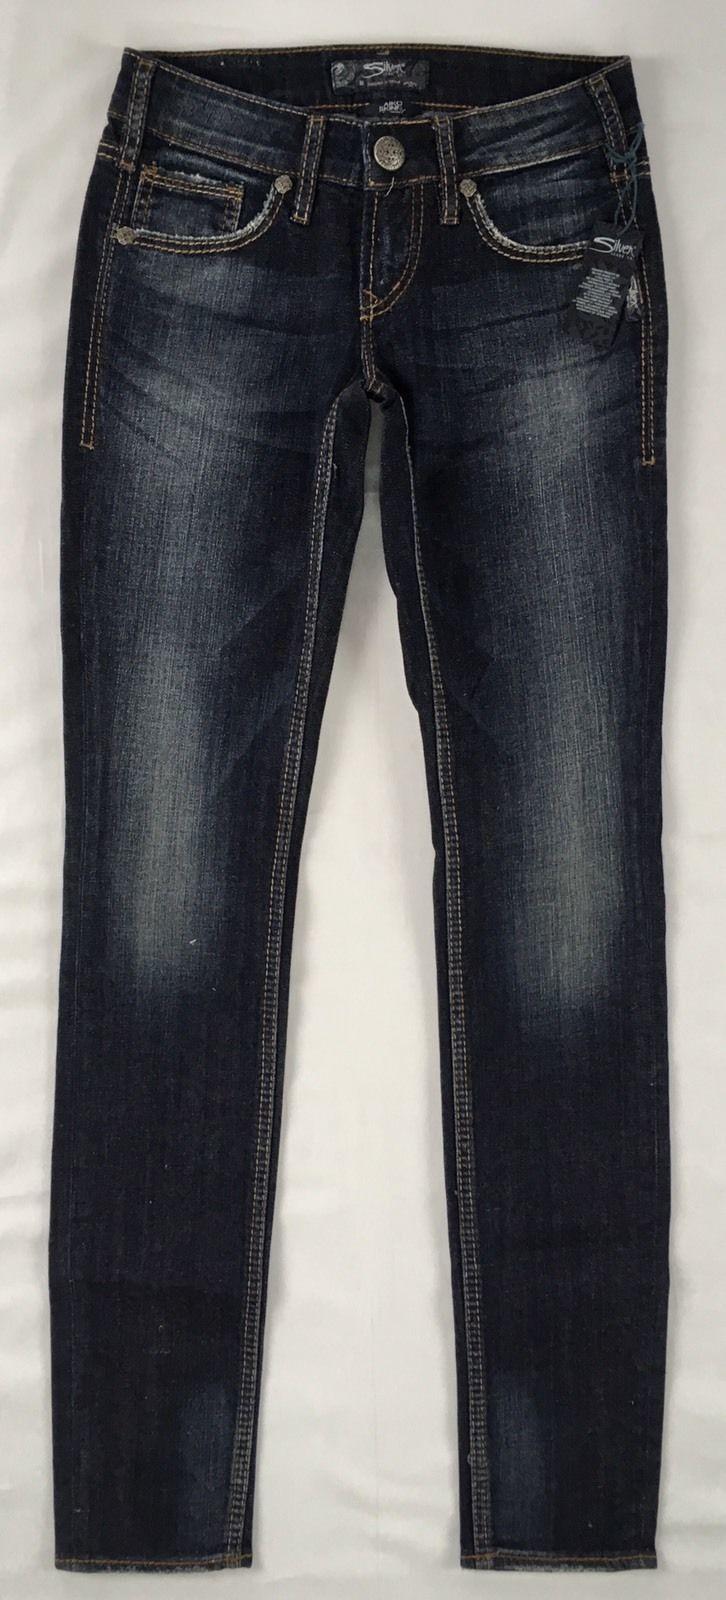 6ce0f14f New SILVER Jeans Sale Buckle Mid Rise Aiko Dark Skinny Stretch Jean 24 X 31